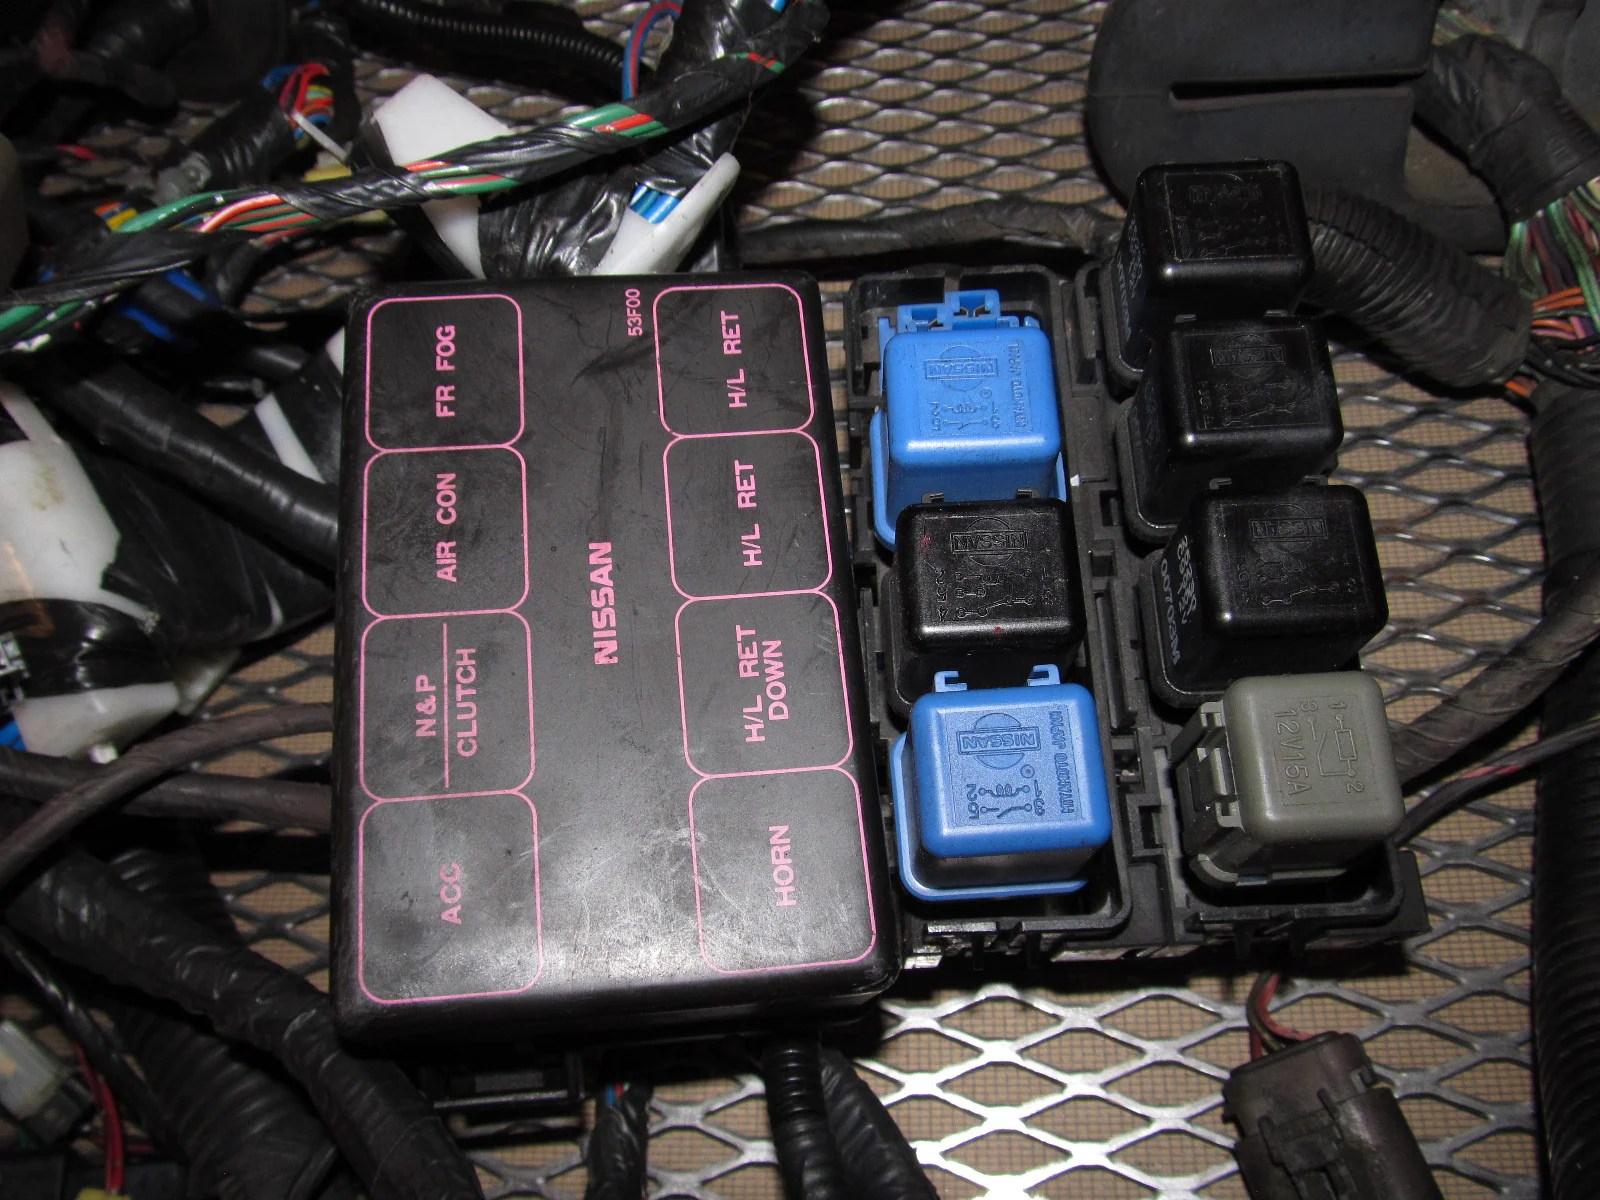 medium resolution of s13 fuse box wiring diagram technic s13 240sx fuse box relocation s13 240sx fuse box